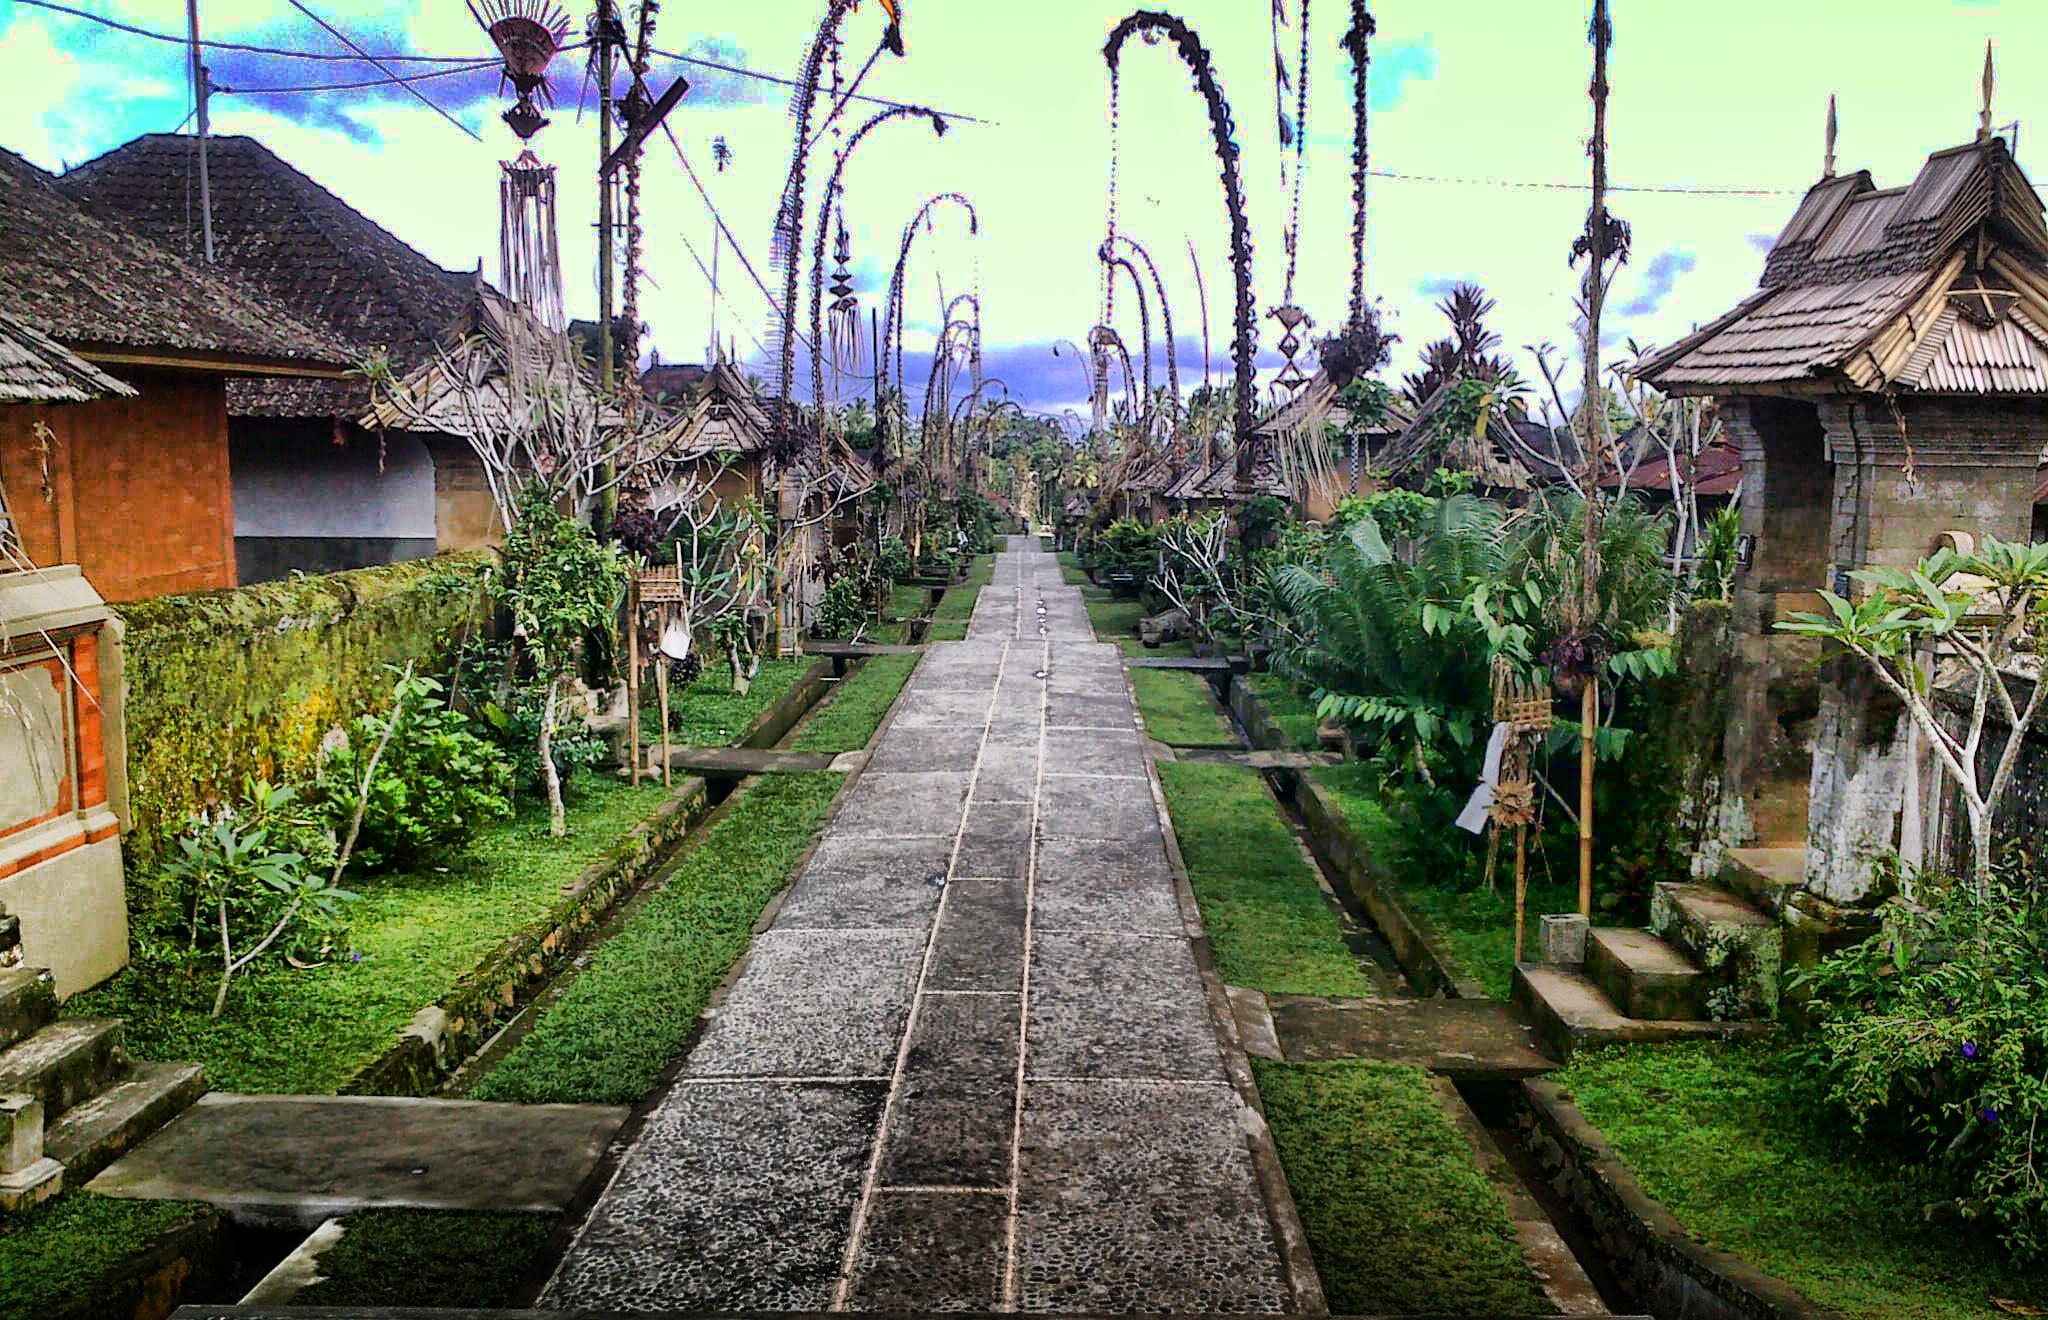 bali-s-mount-batur-penglipuran-dorp-secret-world